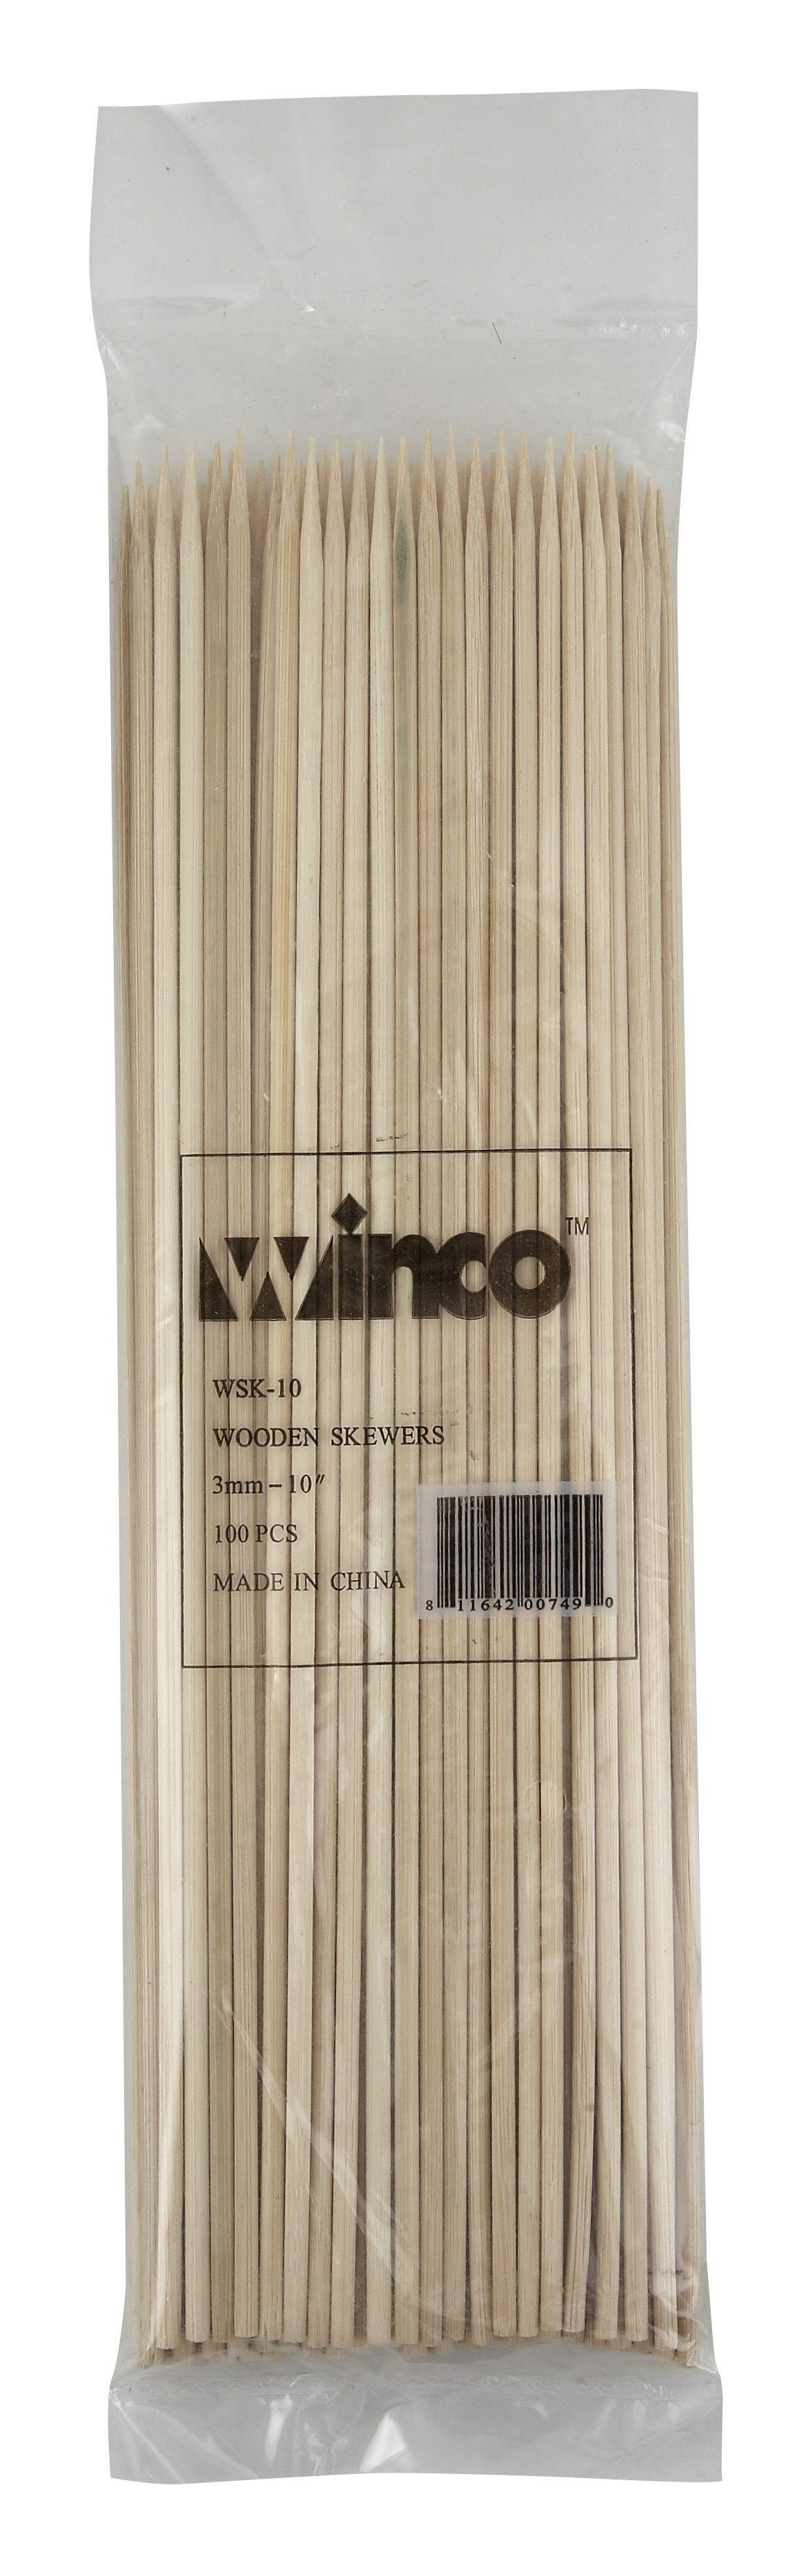 "Winco WSK-10 Bamboo Skewers 10"""